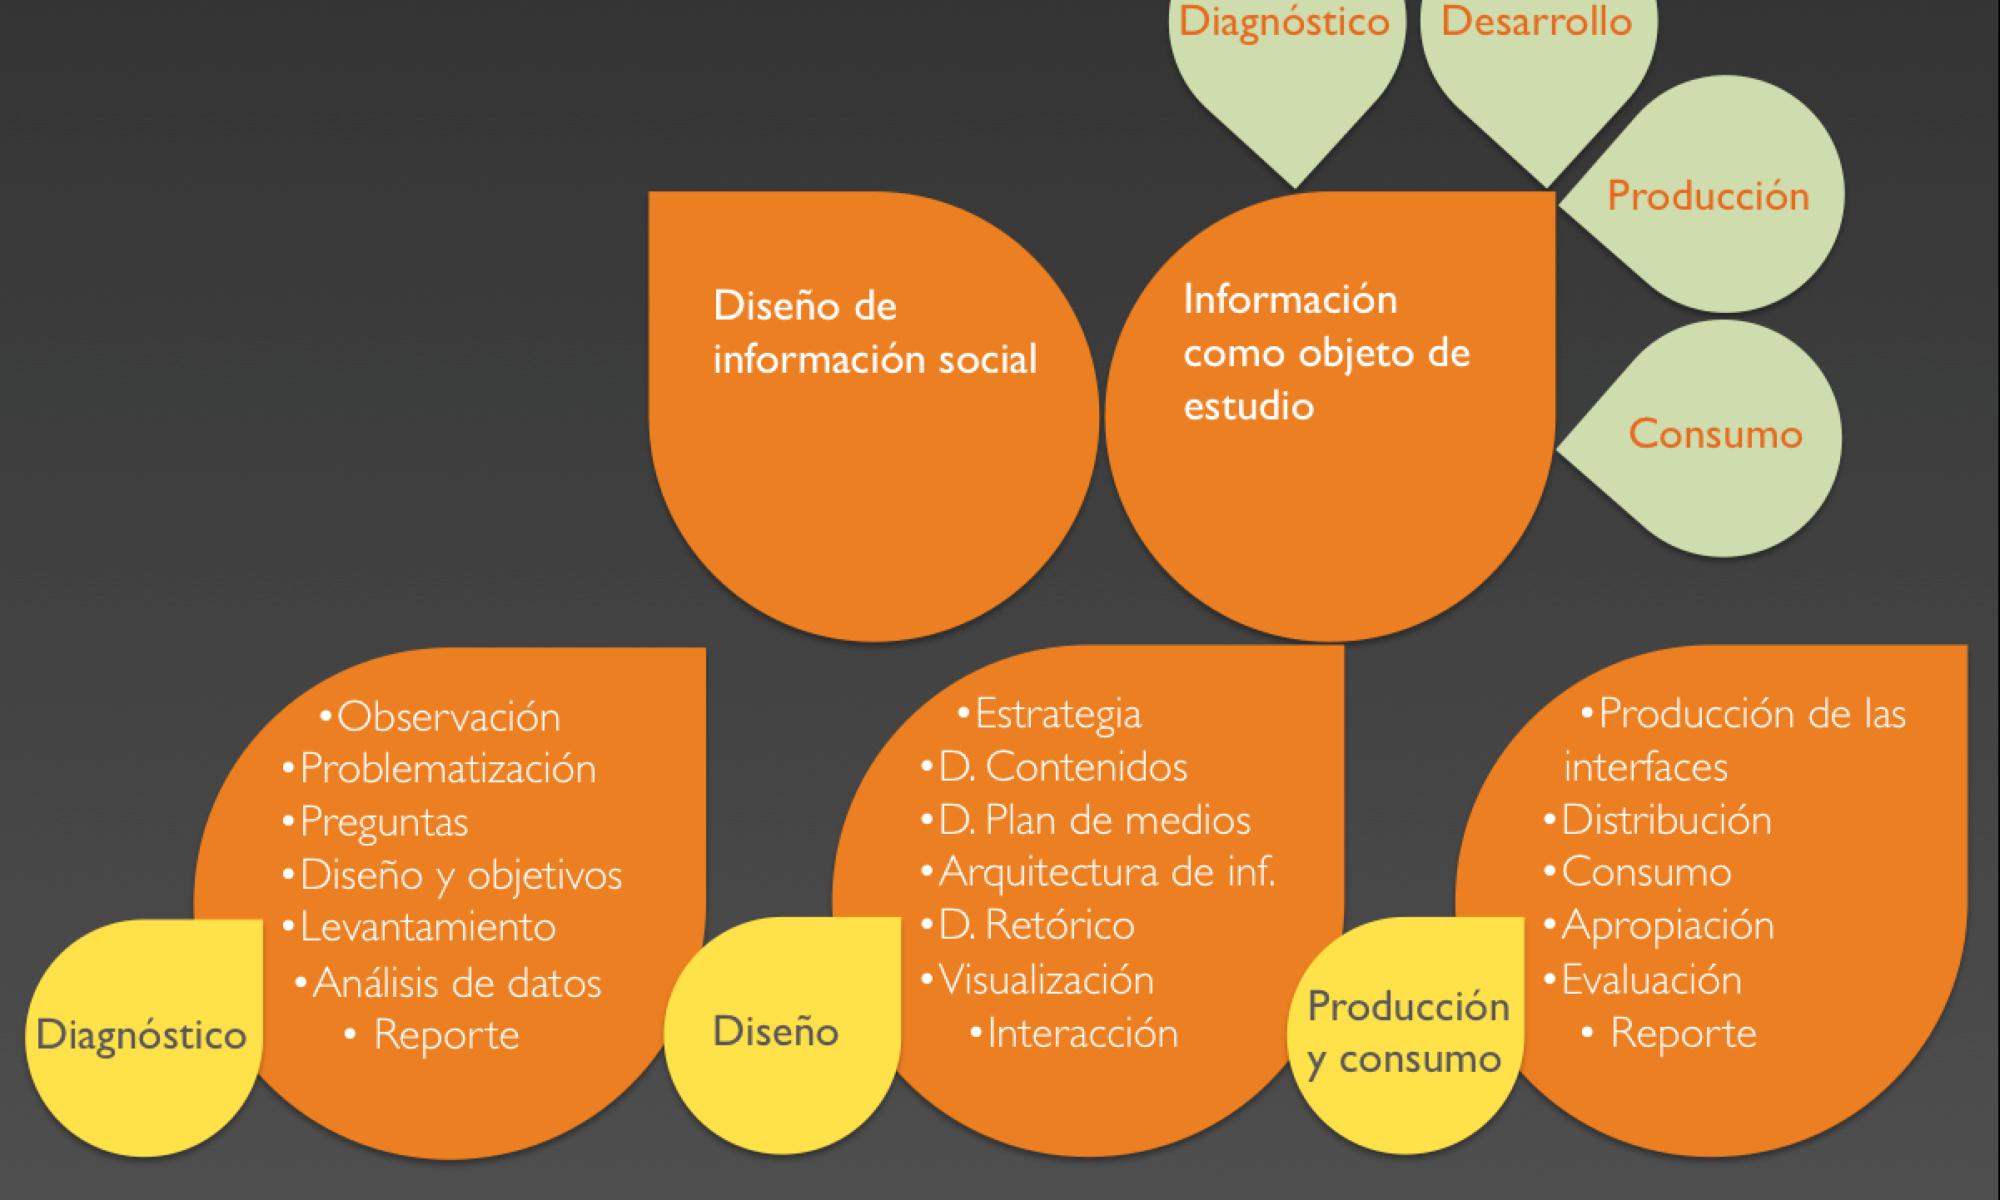 Diseño de Información Social